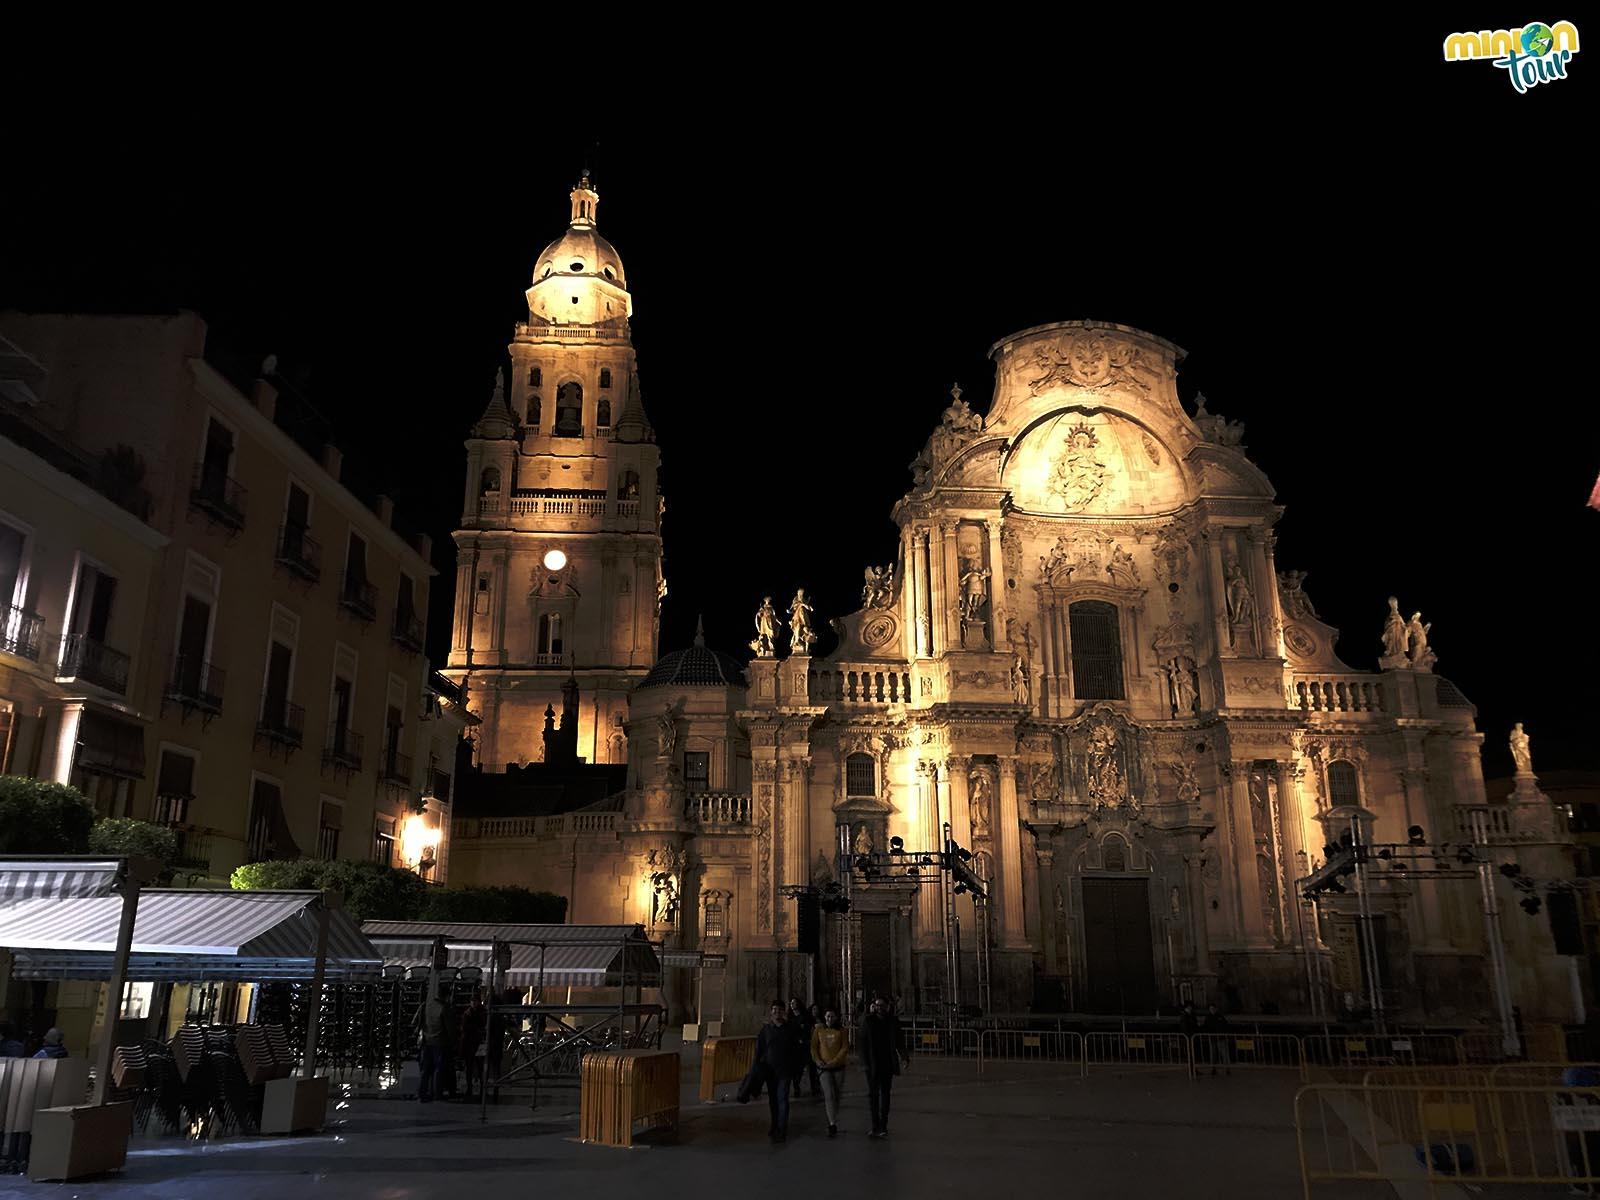 La Catedral de Murcia de noche